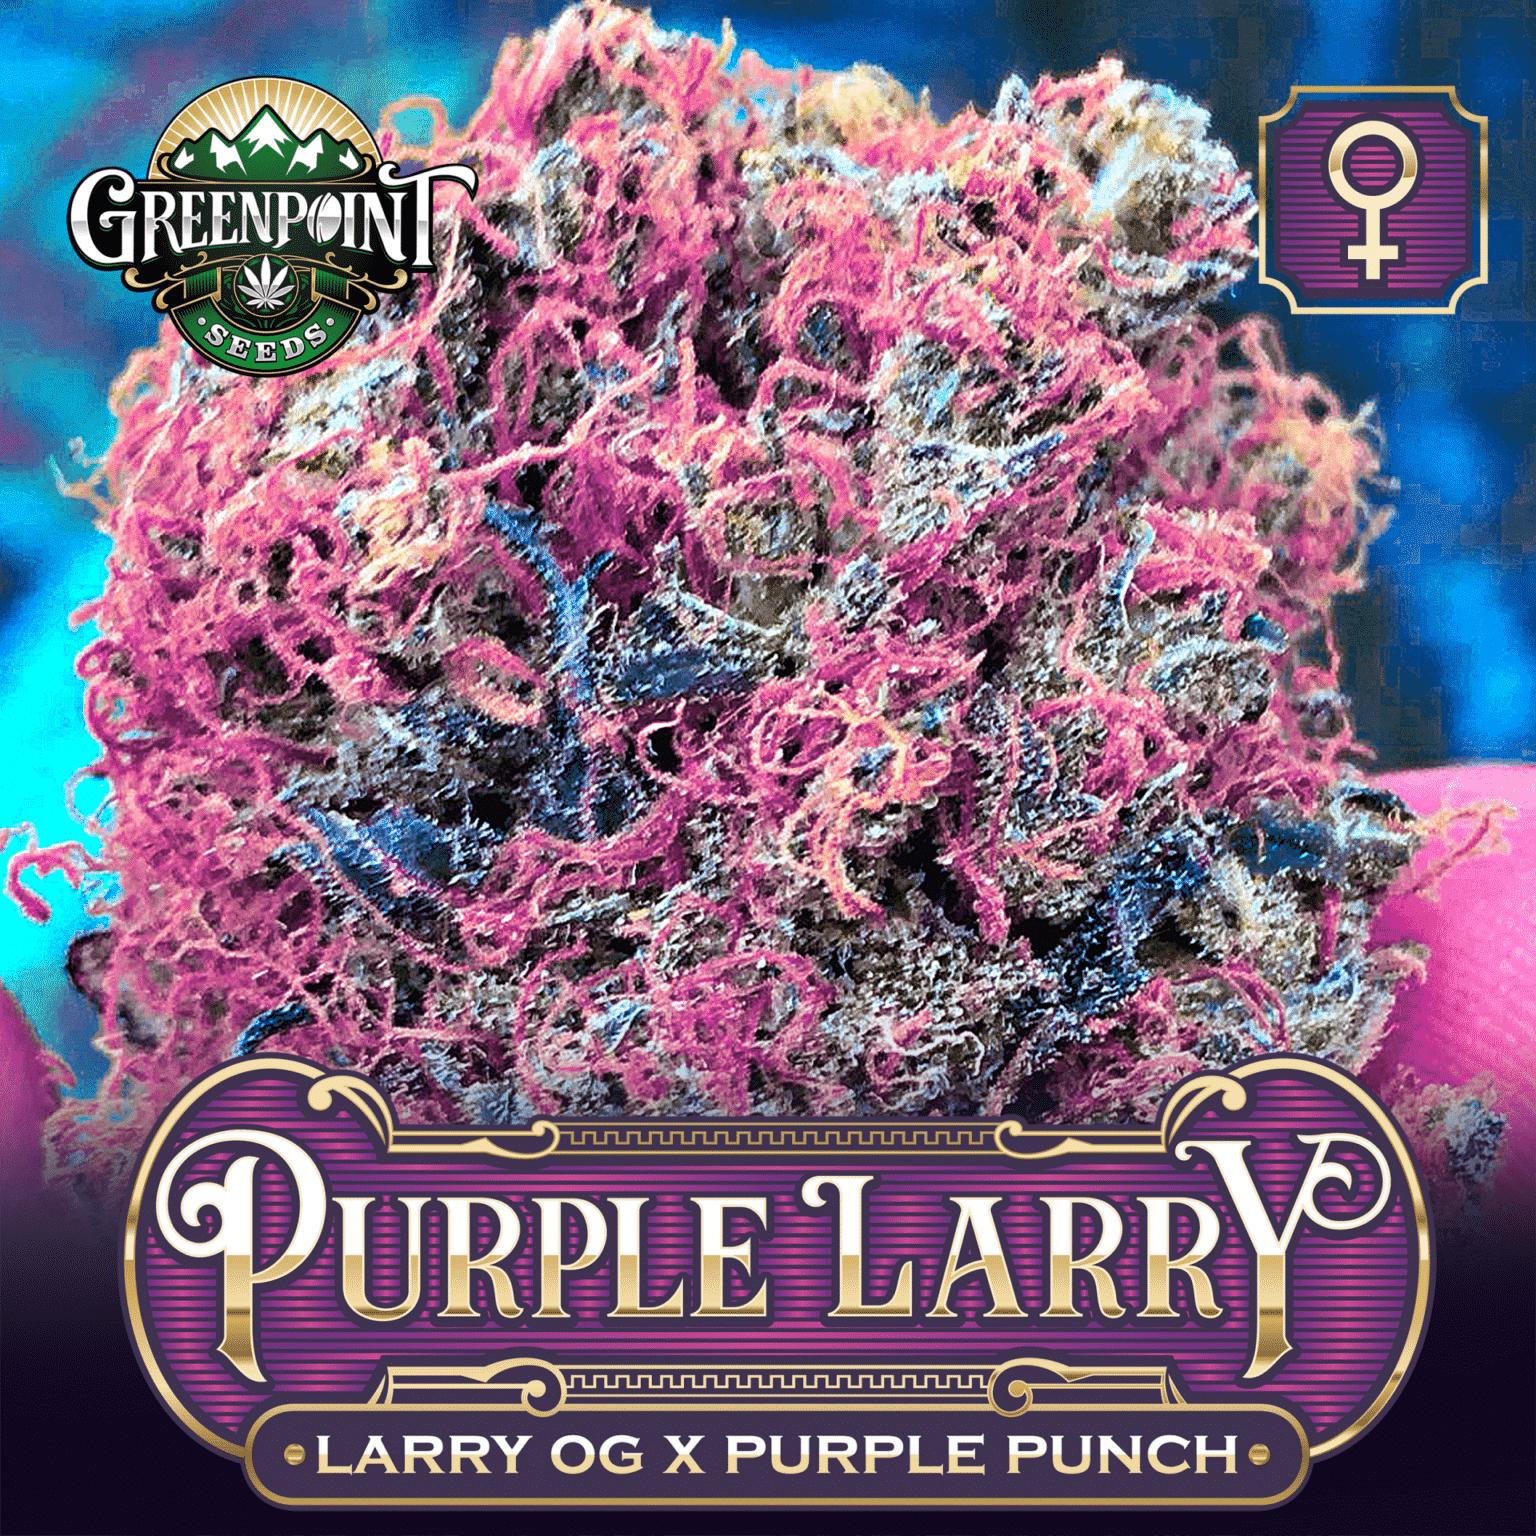 Purple Larry Feminized Cannabis - Larry OG x Purple Punch Marijuana Seeds